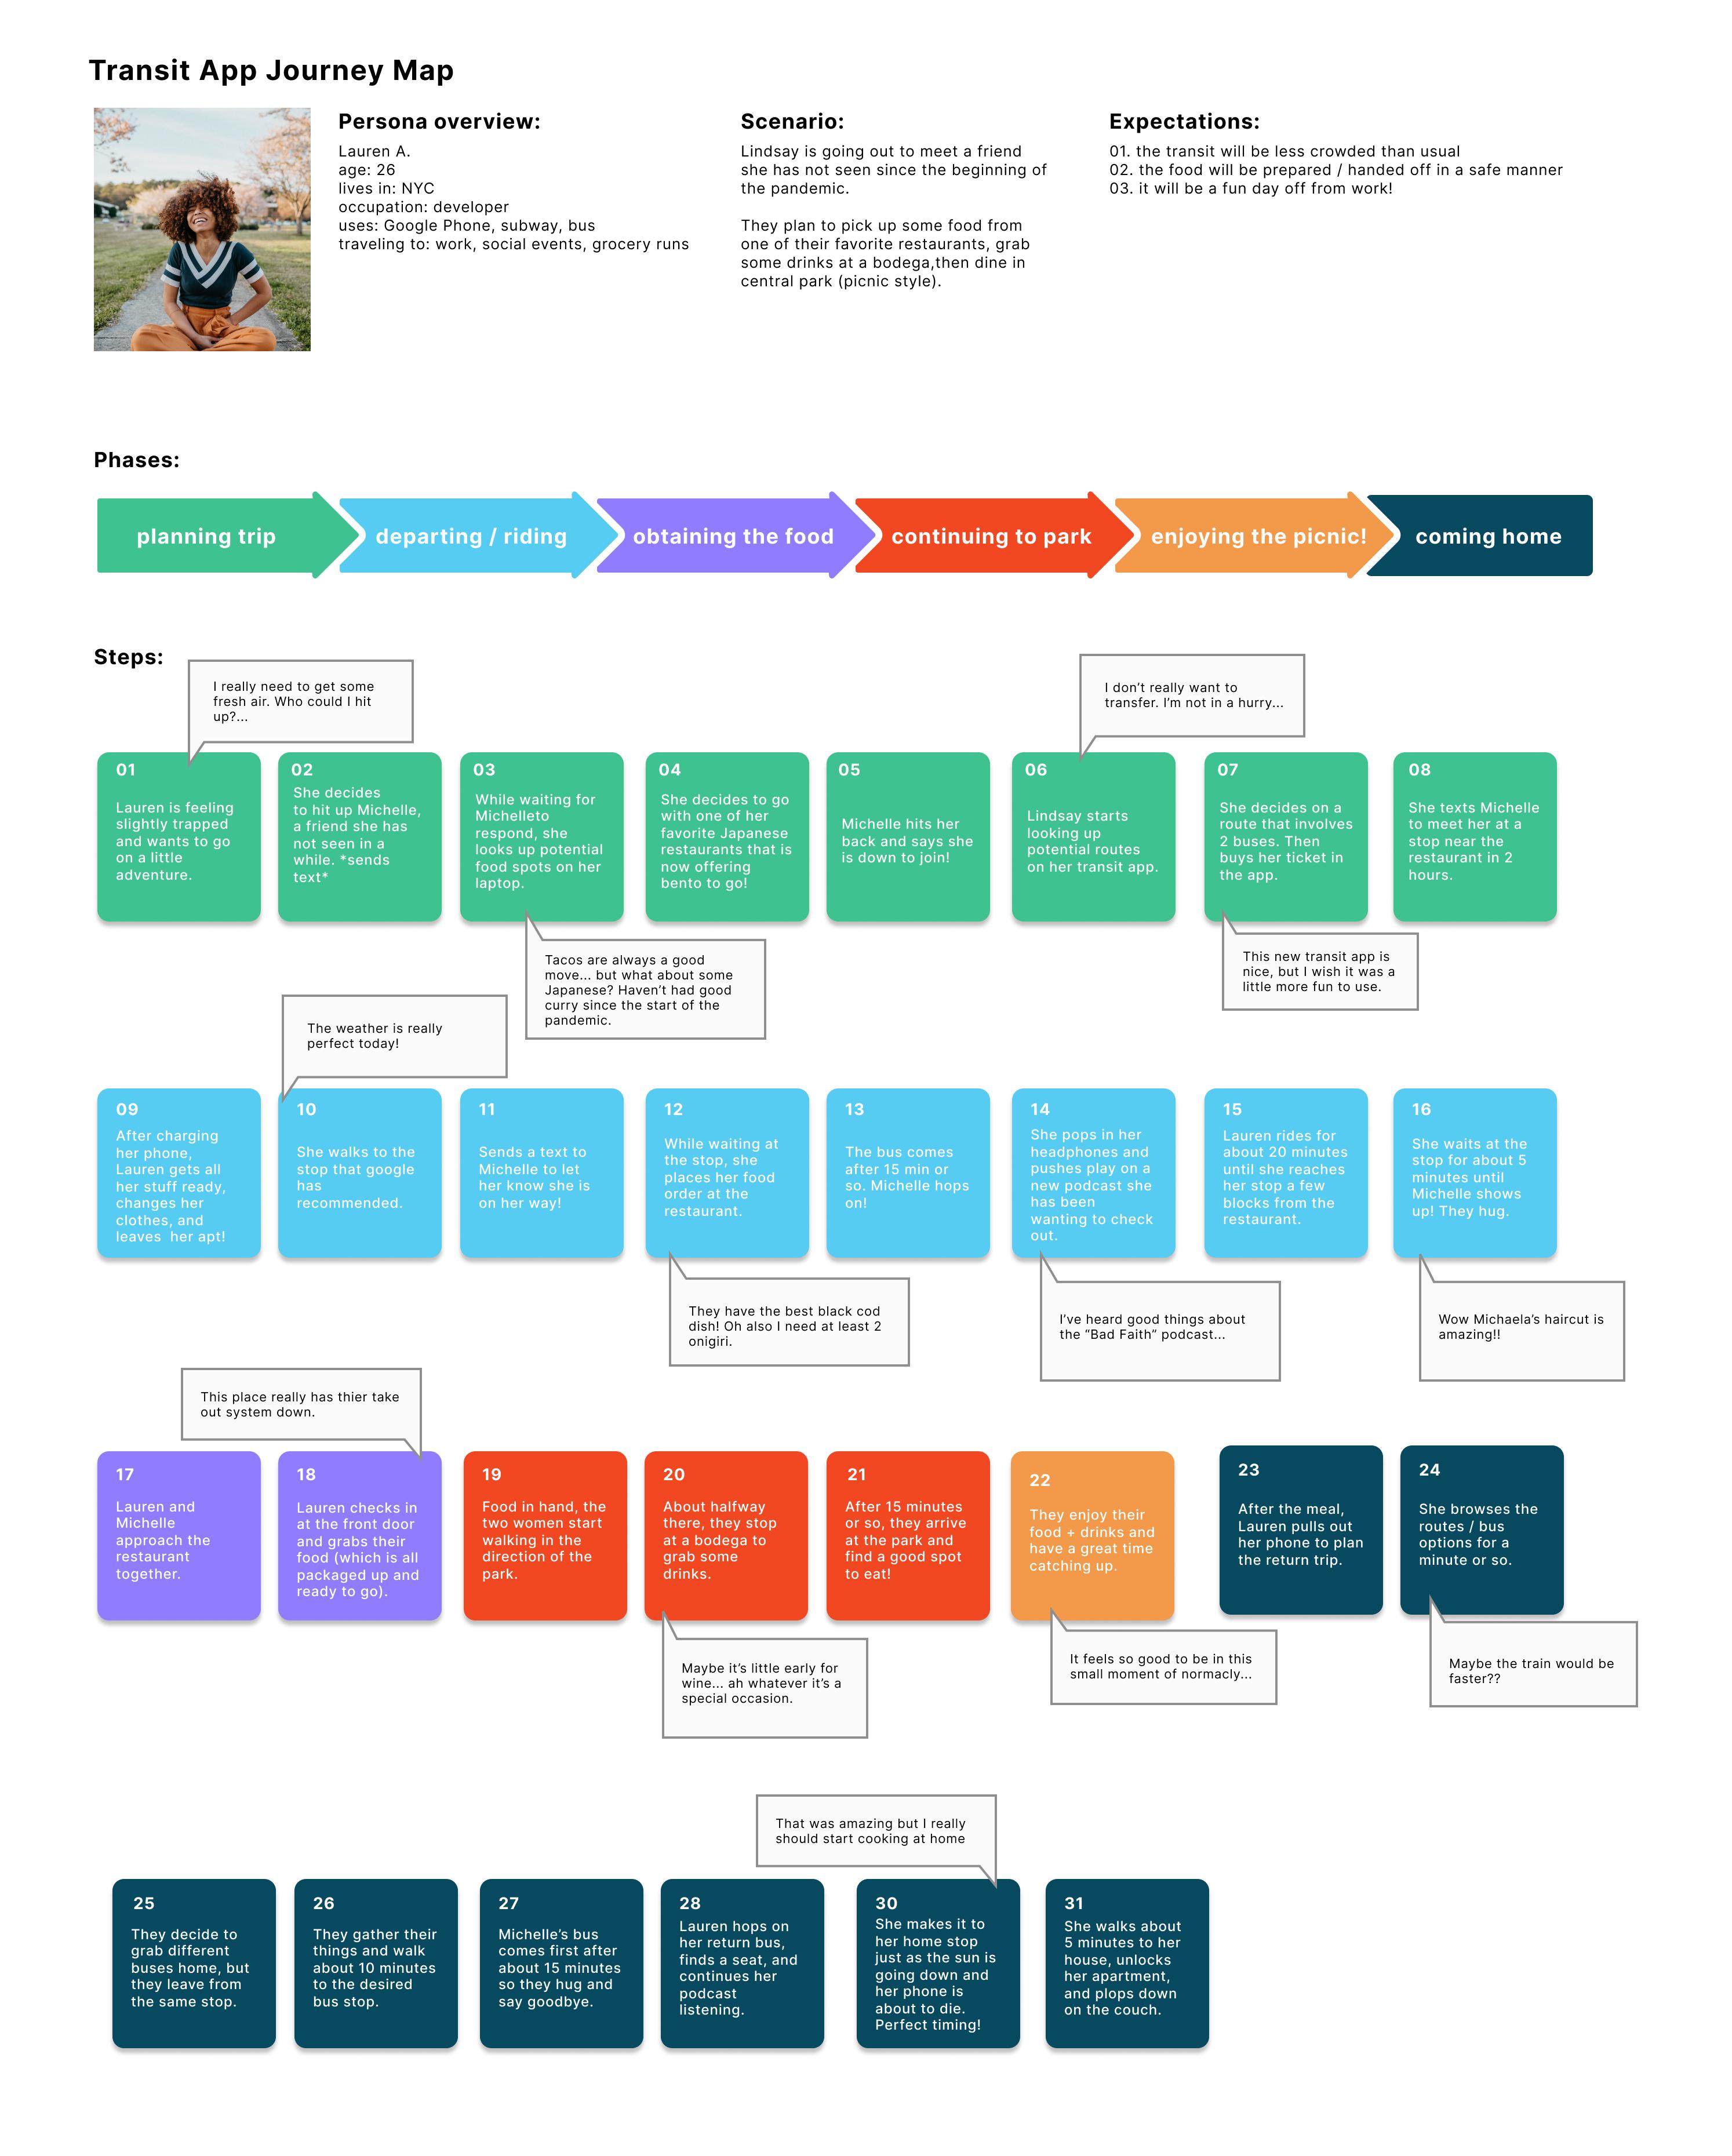 Joyride Transit persona journey map